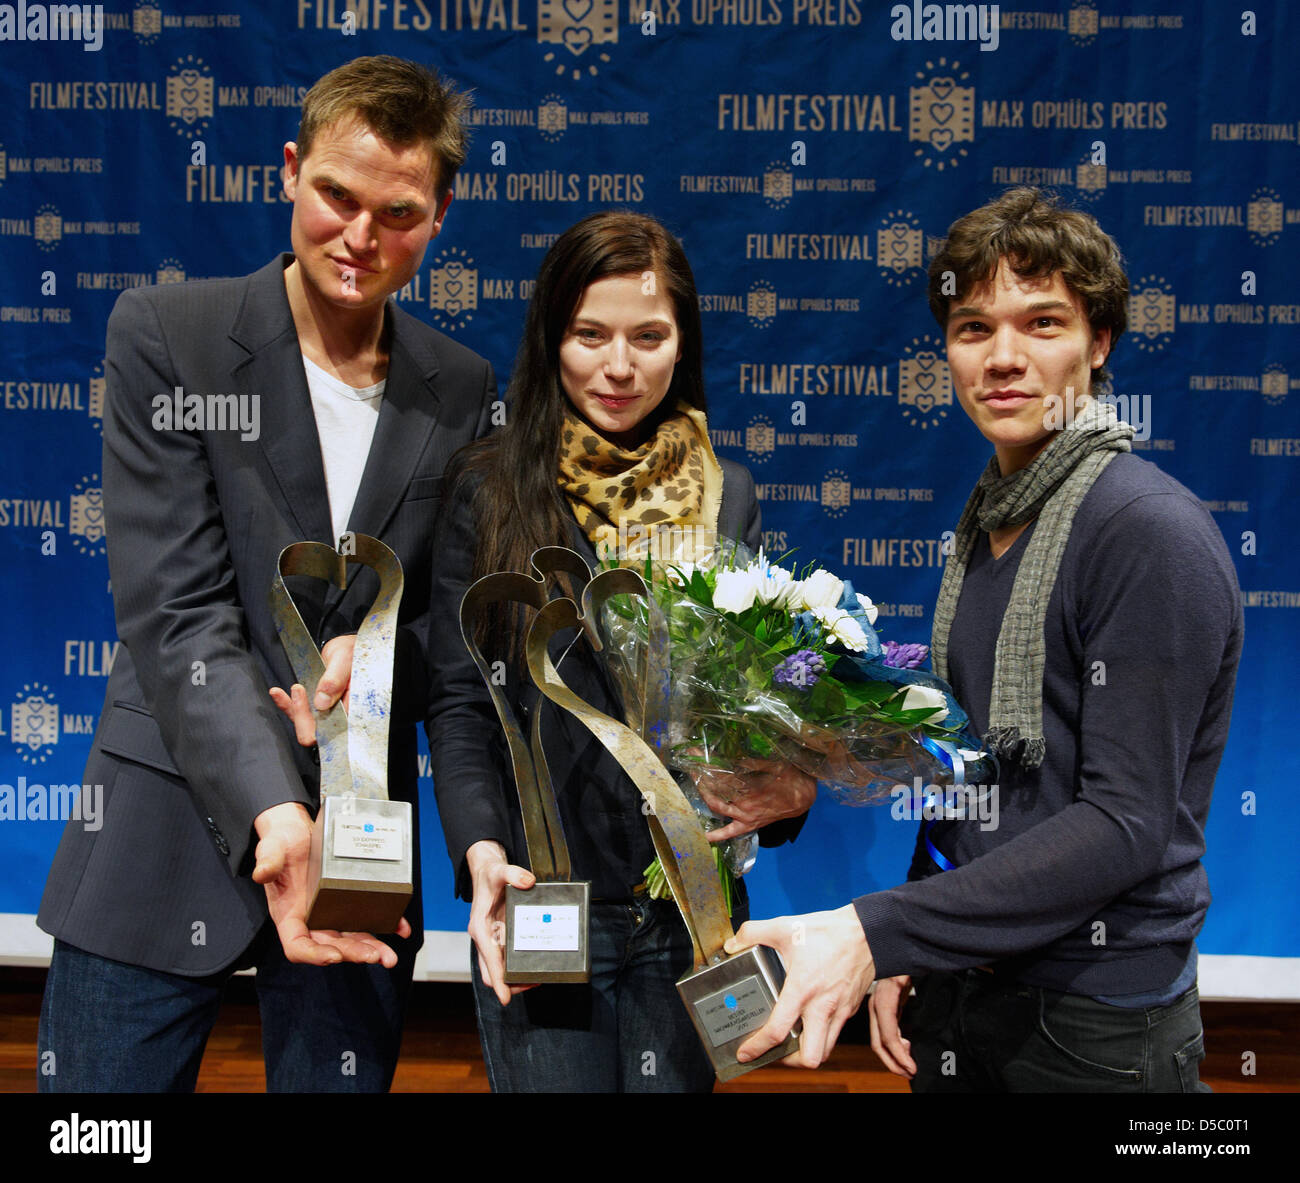 (L-R) German actor Fabian Hinrichs, Austrian actres Nora von Waldstaetten and German actor Sebastian Urzendowsky - Stock Image